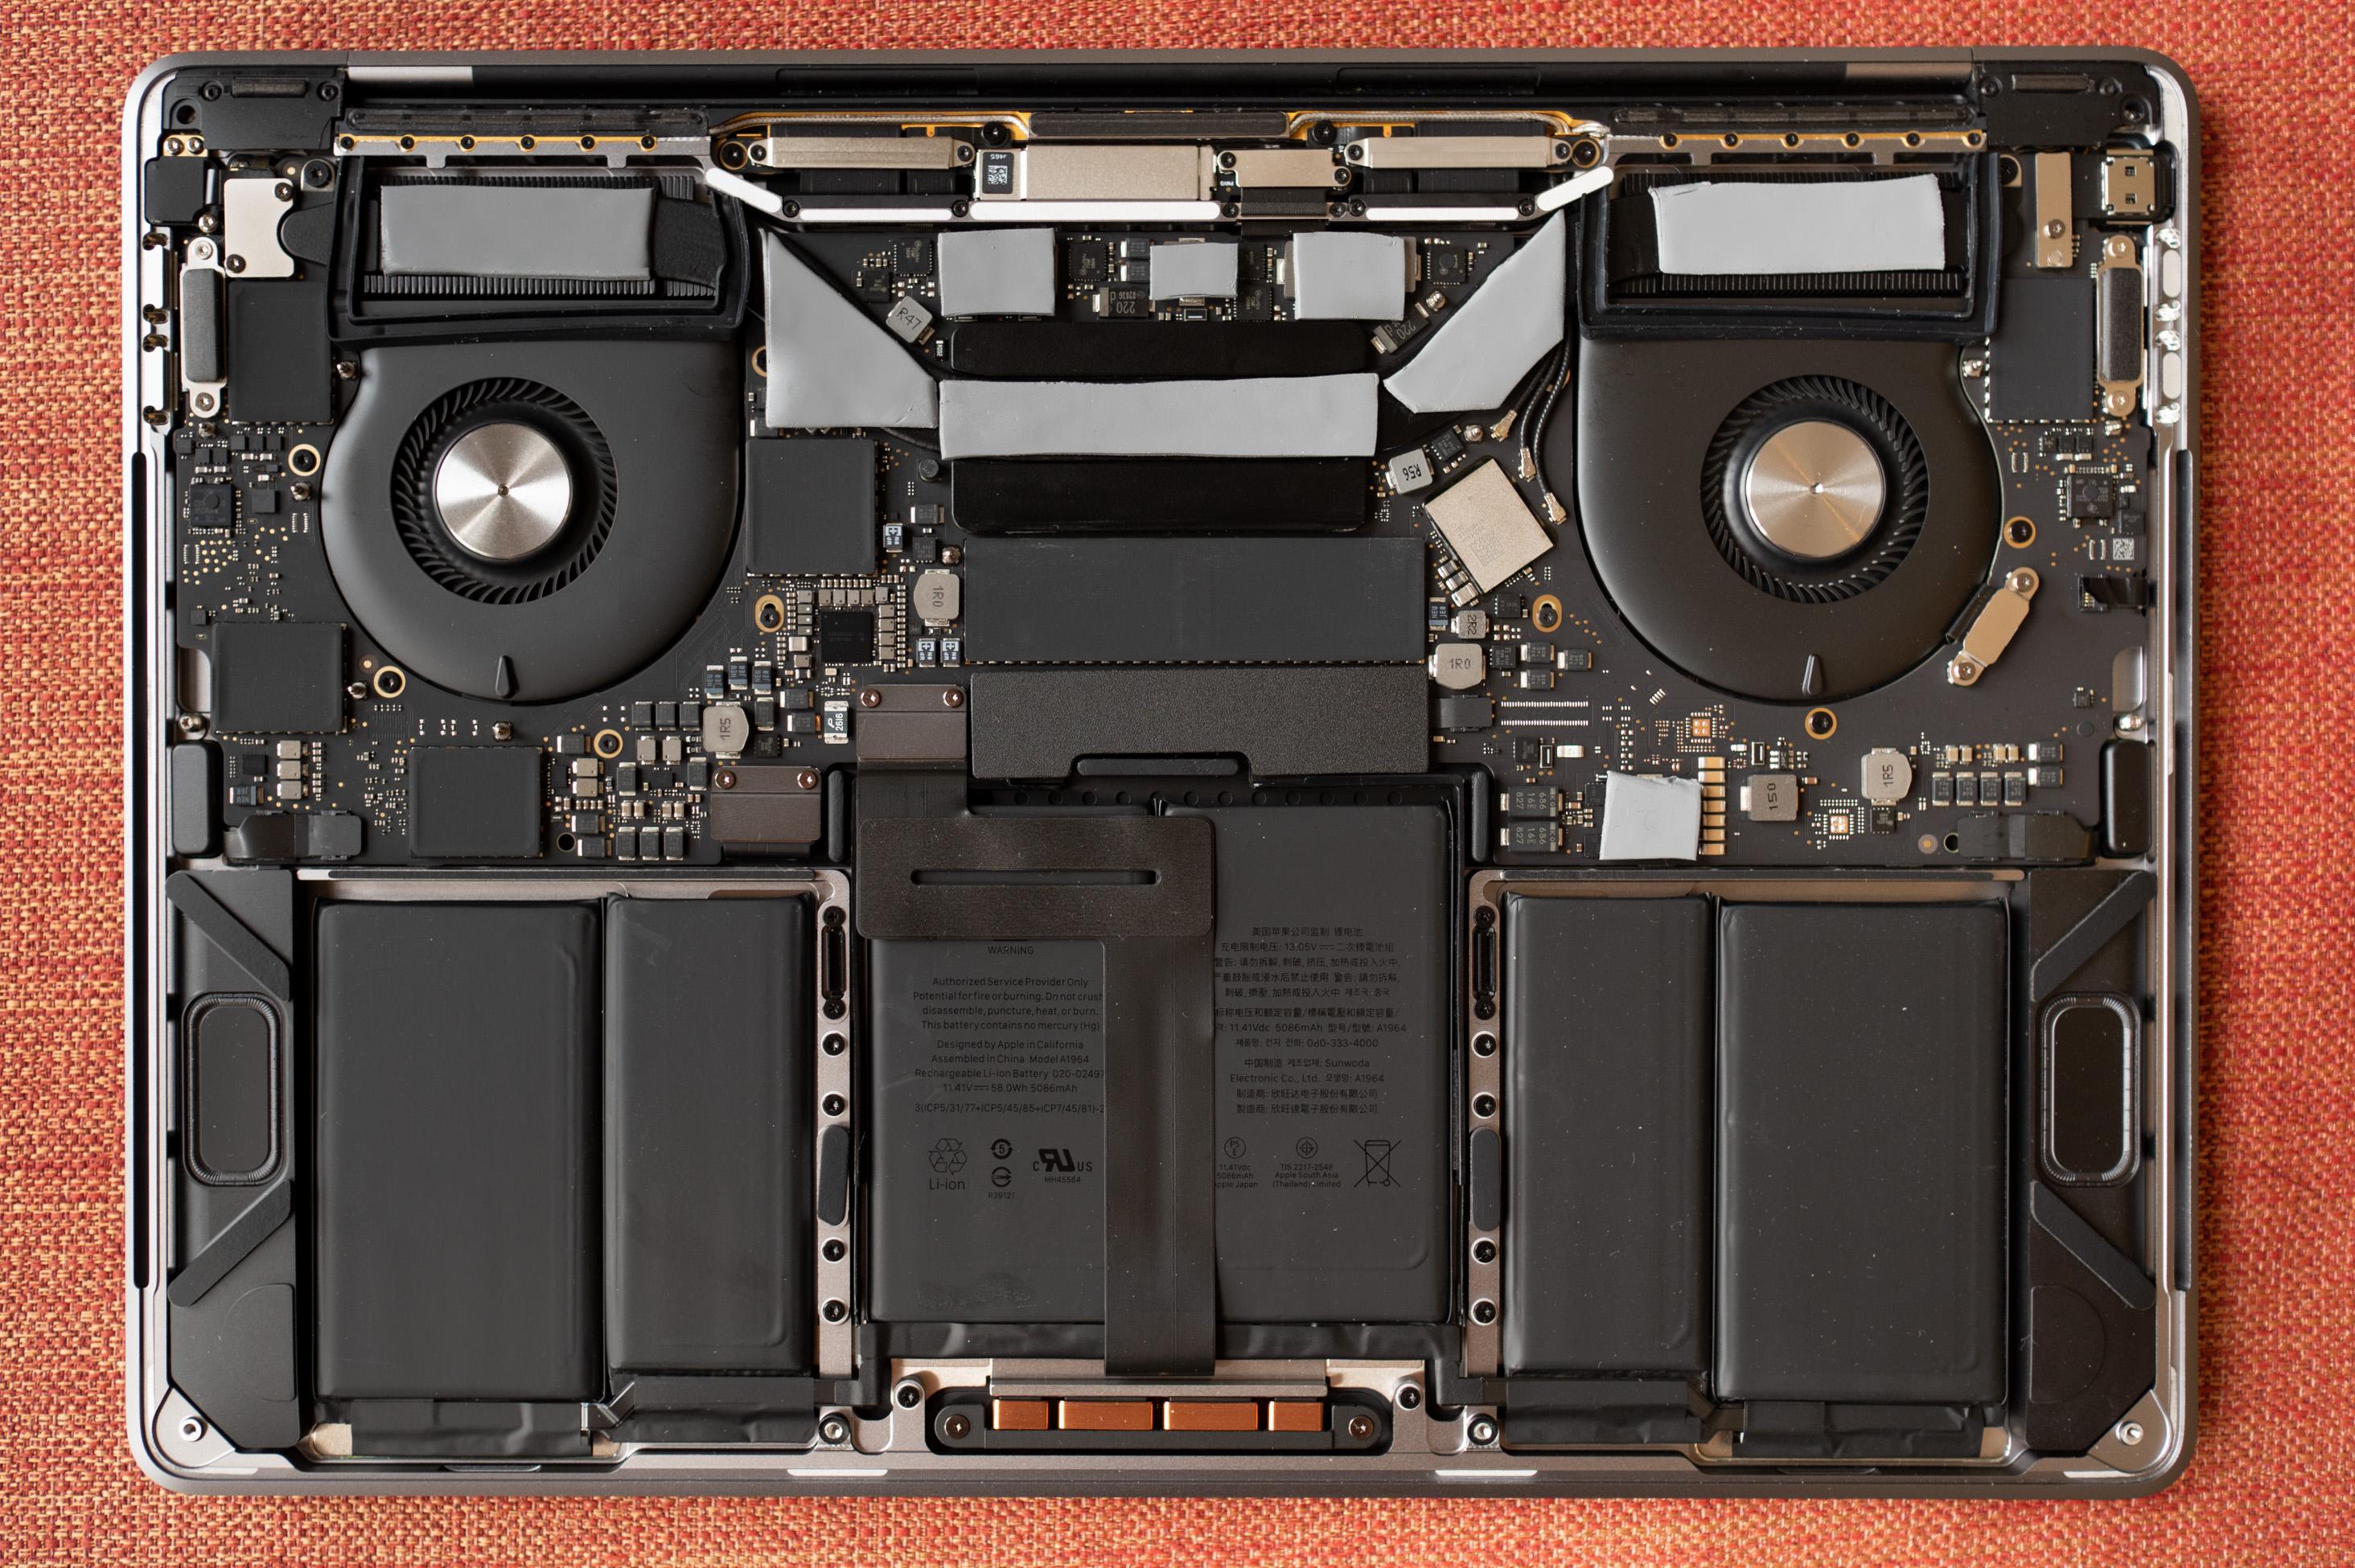 2018 MacBook Pro cooling mod | MacRumors Forums